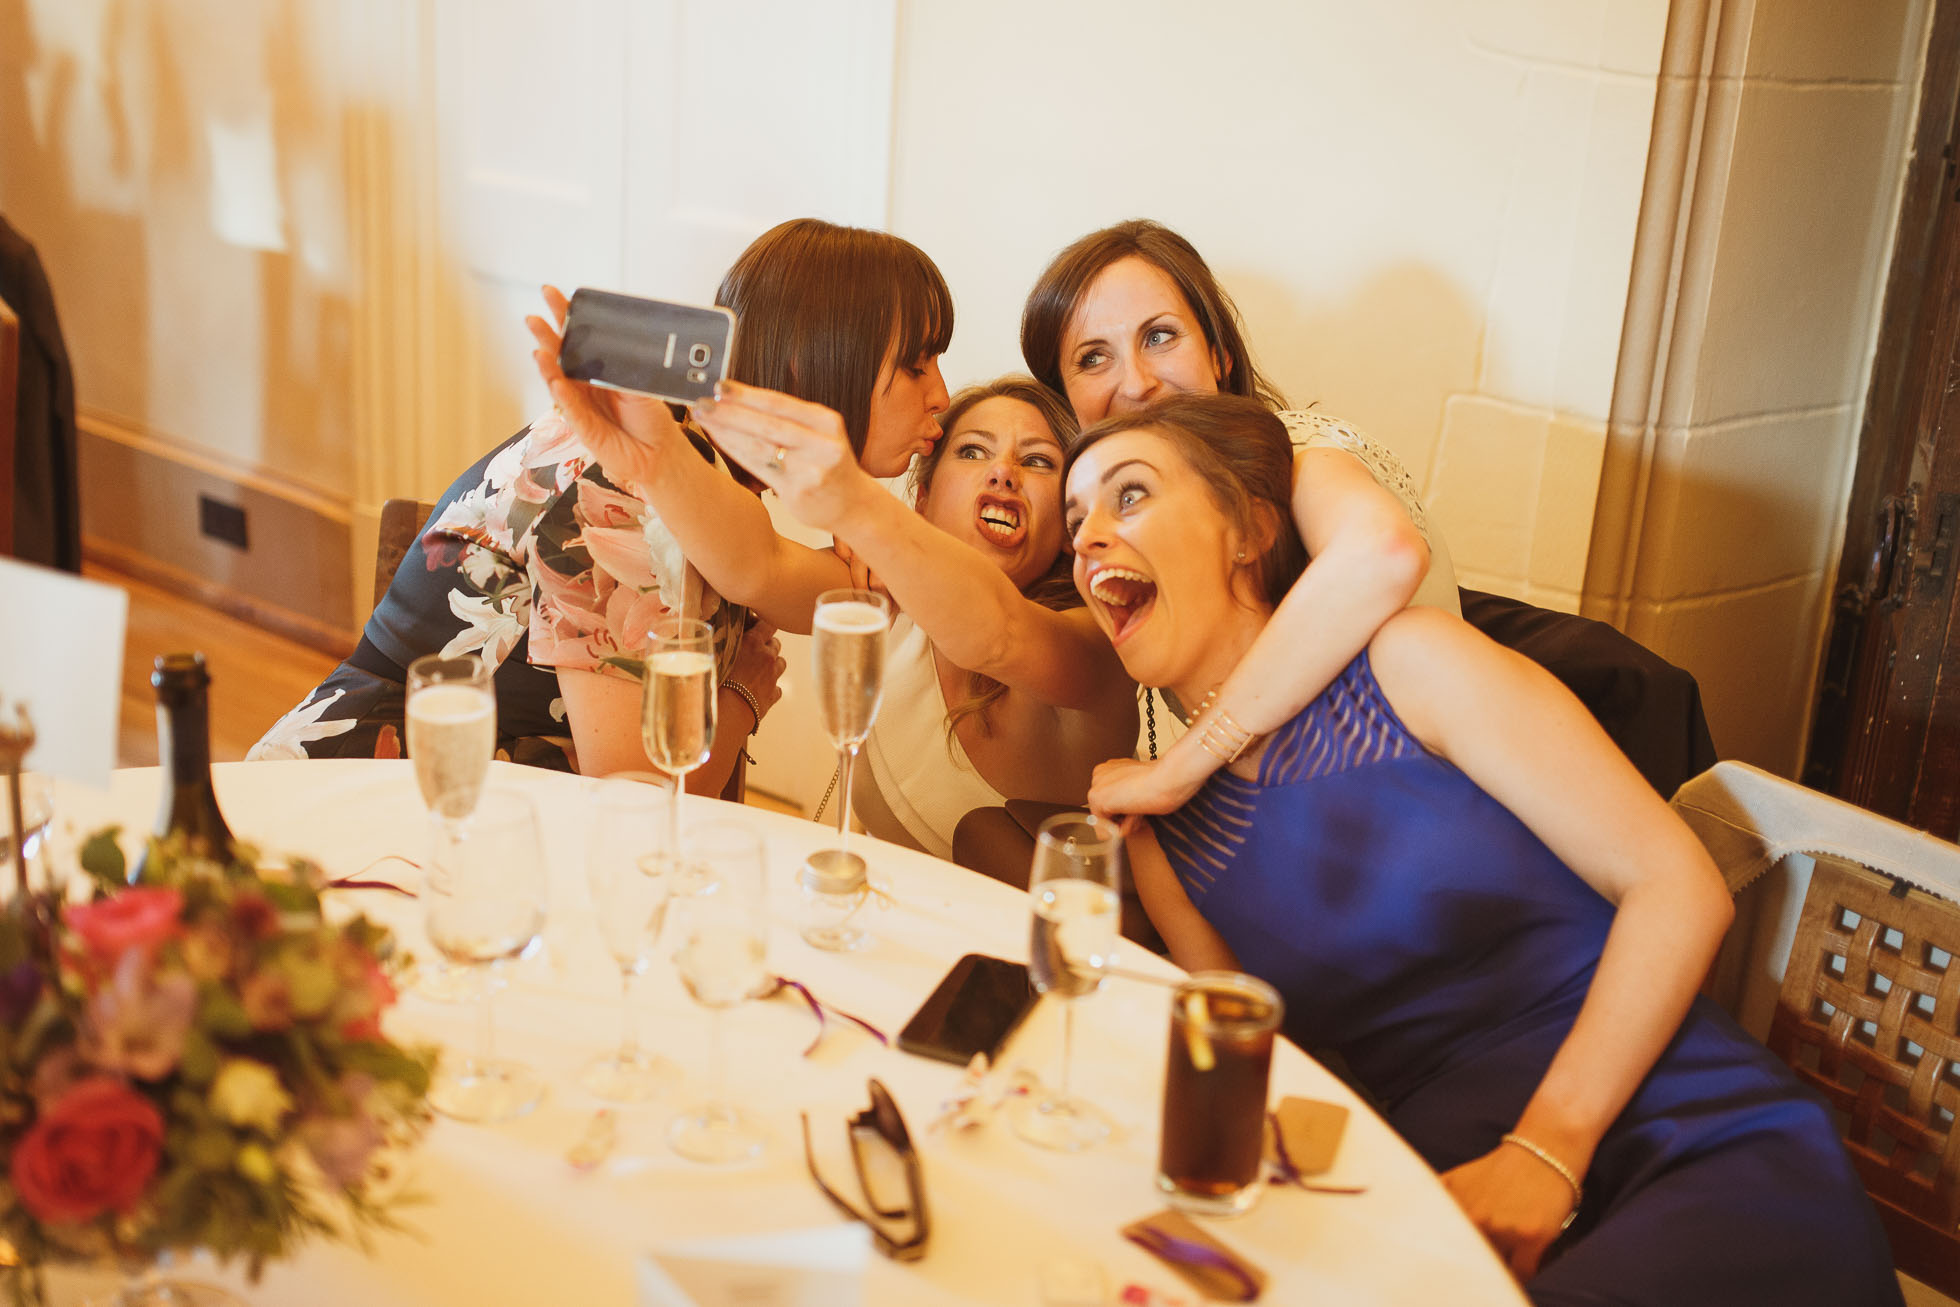 denton-hall-wedding-photographer-58.jpg